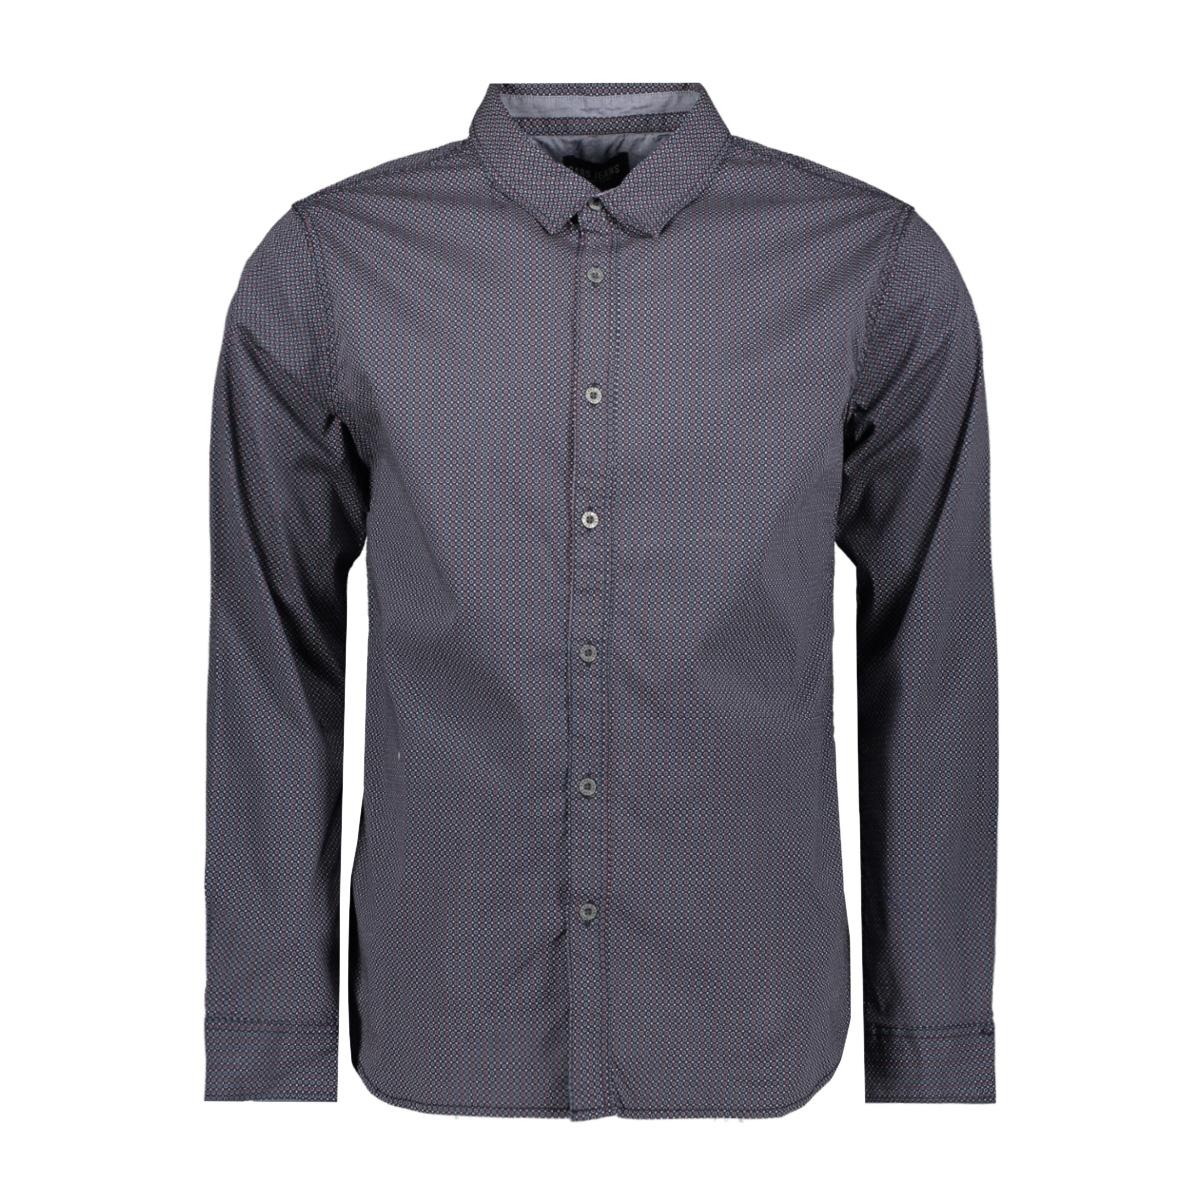 sady shirt 4413012 cars overhemd navy